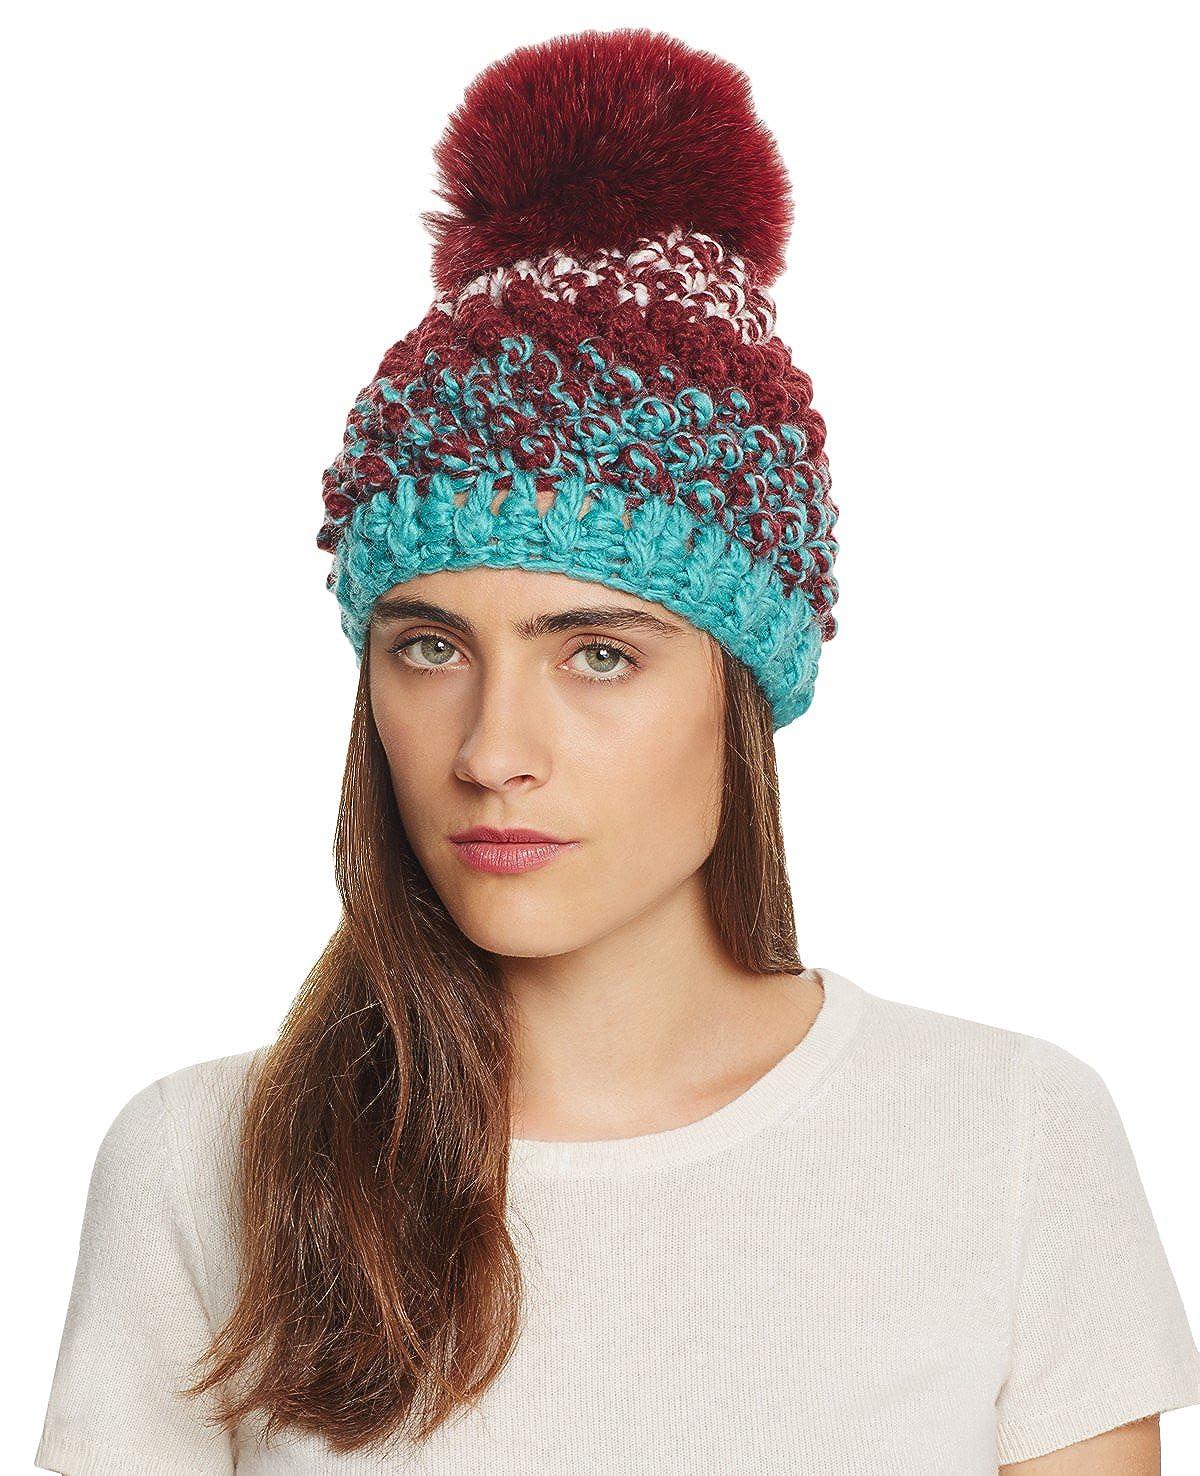 Kyi Kyi Canada Women s Popcorn Knitted Beanie Hat with Fox Fur Pom ... 2dda56a1ffc8